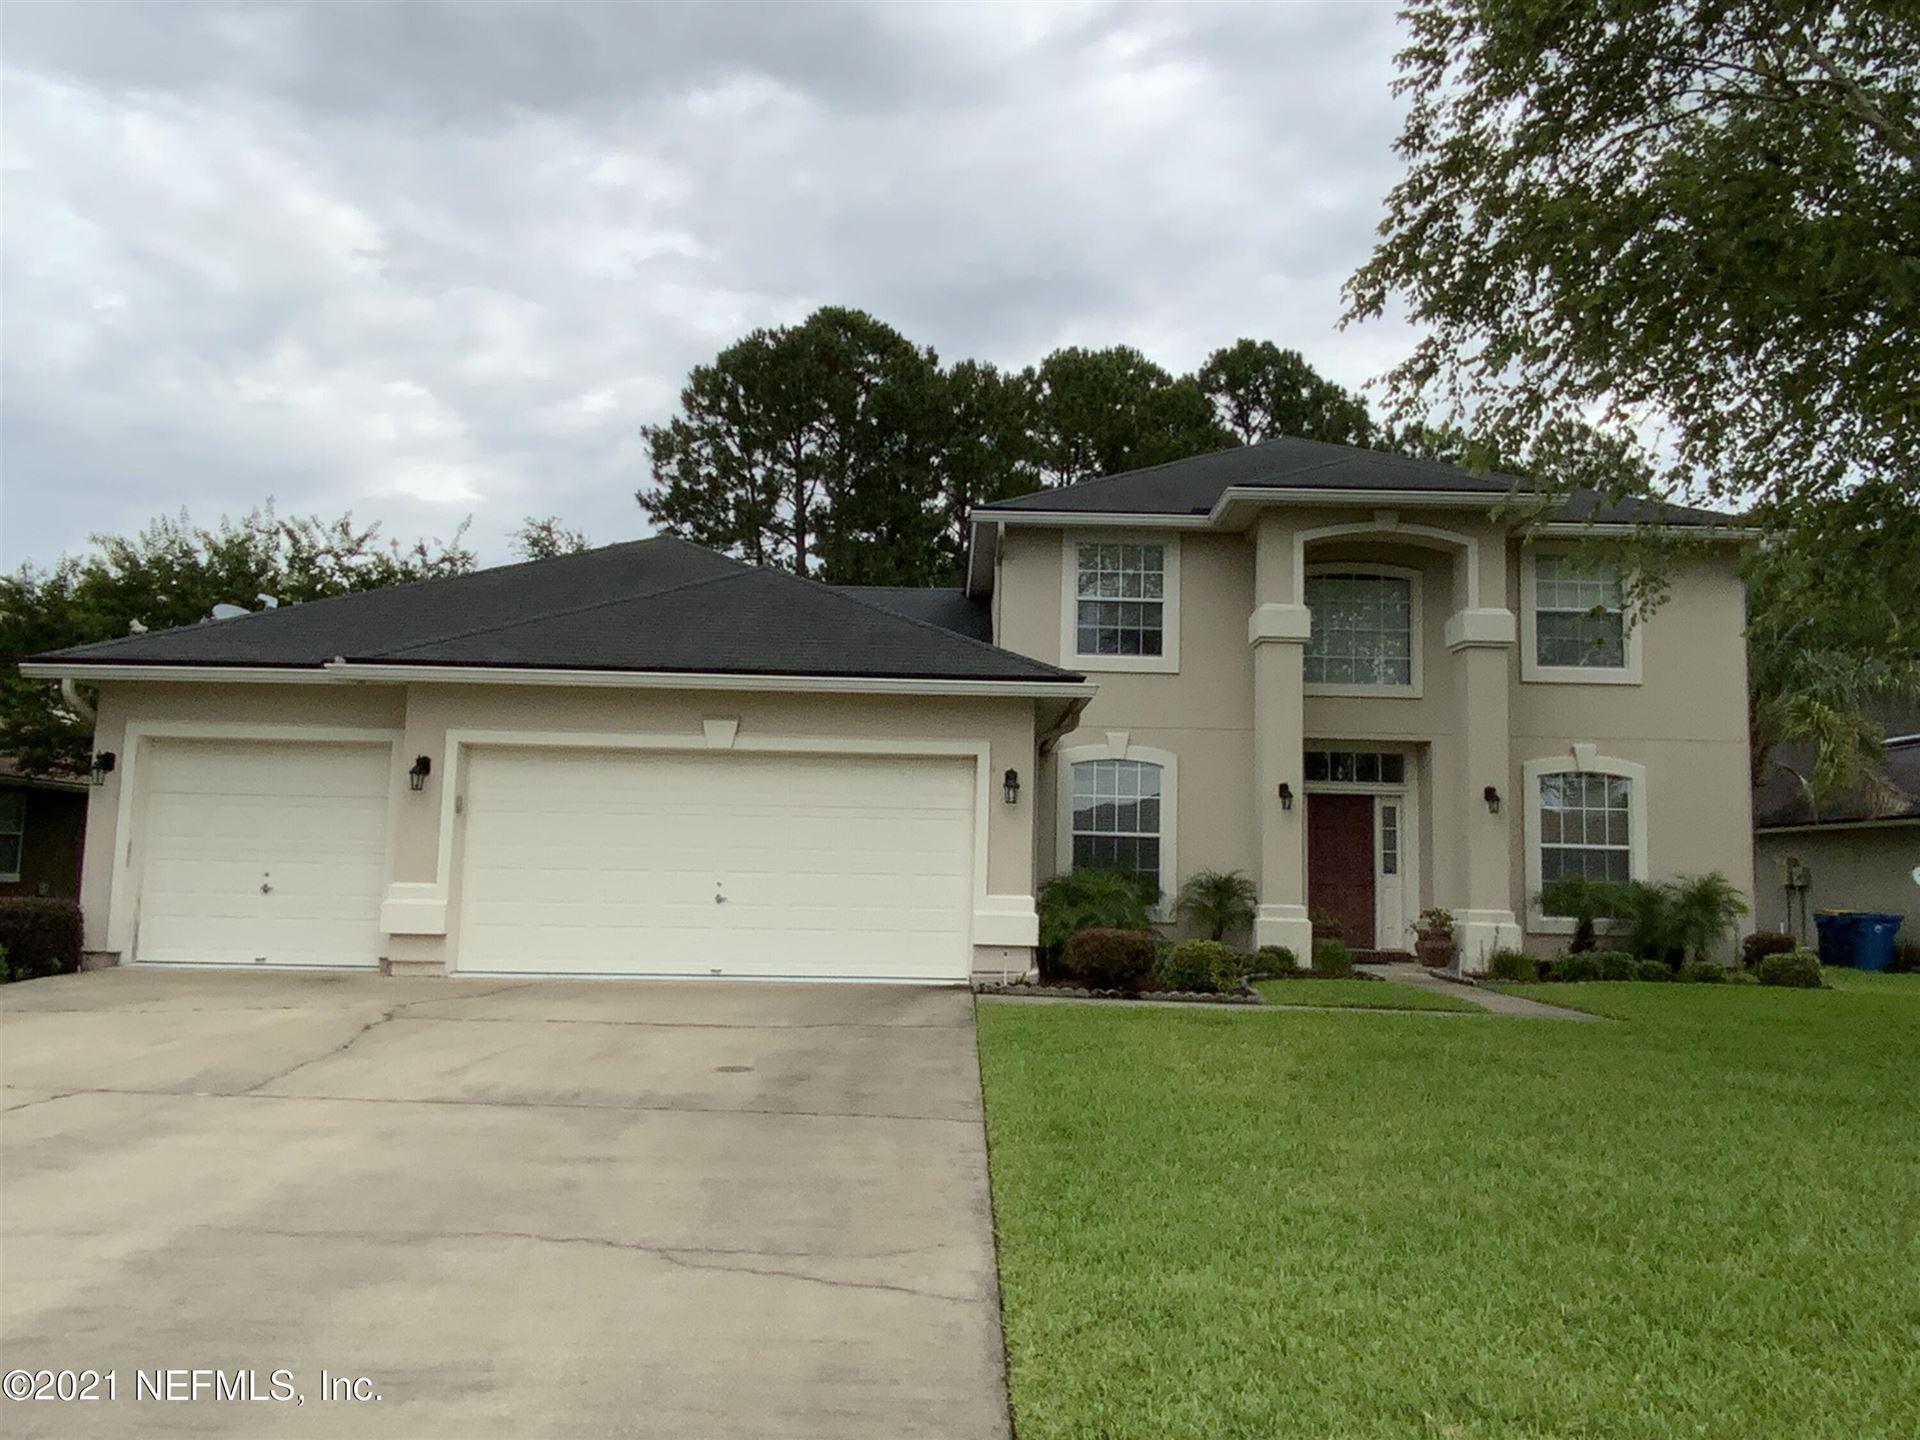 11533 JERRY ADAM DR, Jacksonville, FL 32218 - MLS#: 1116680